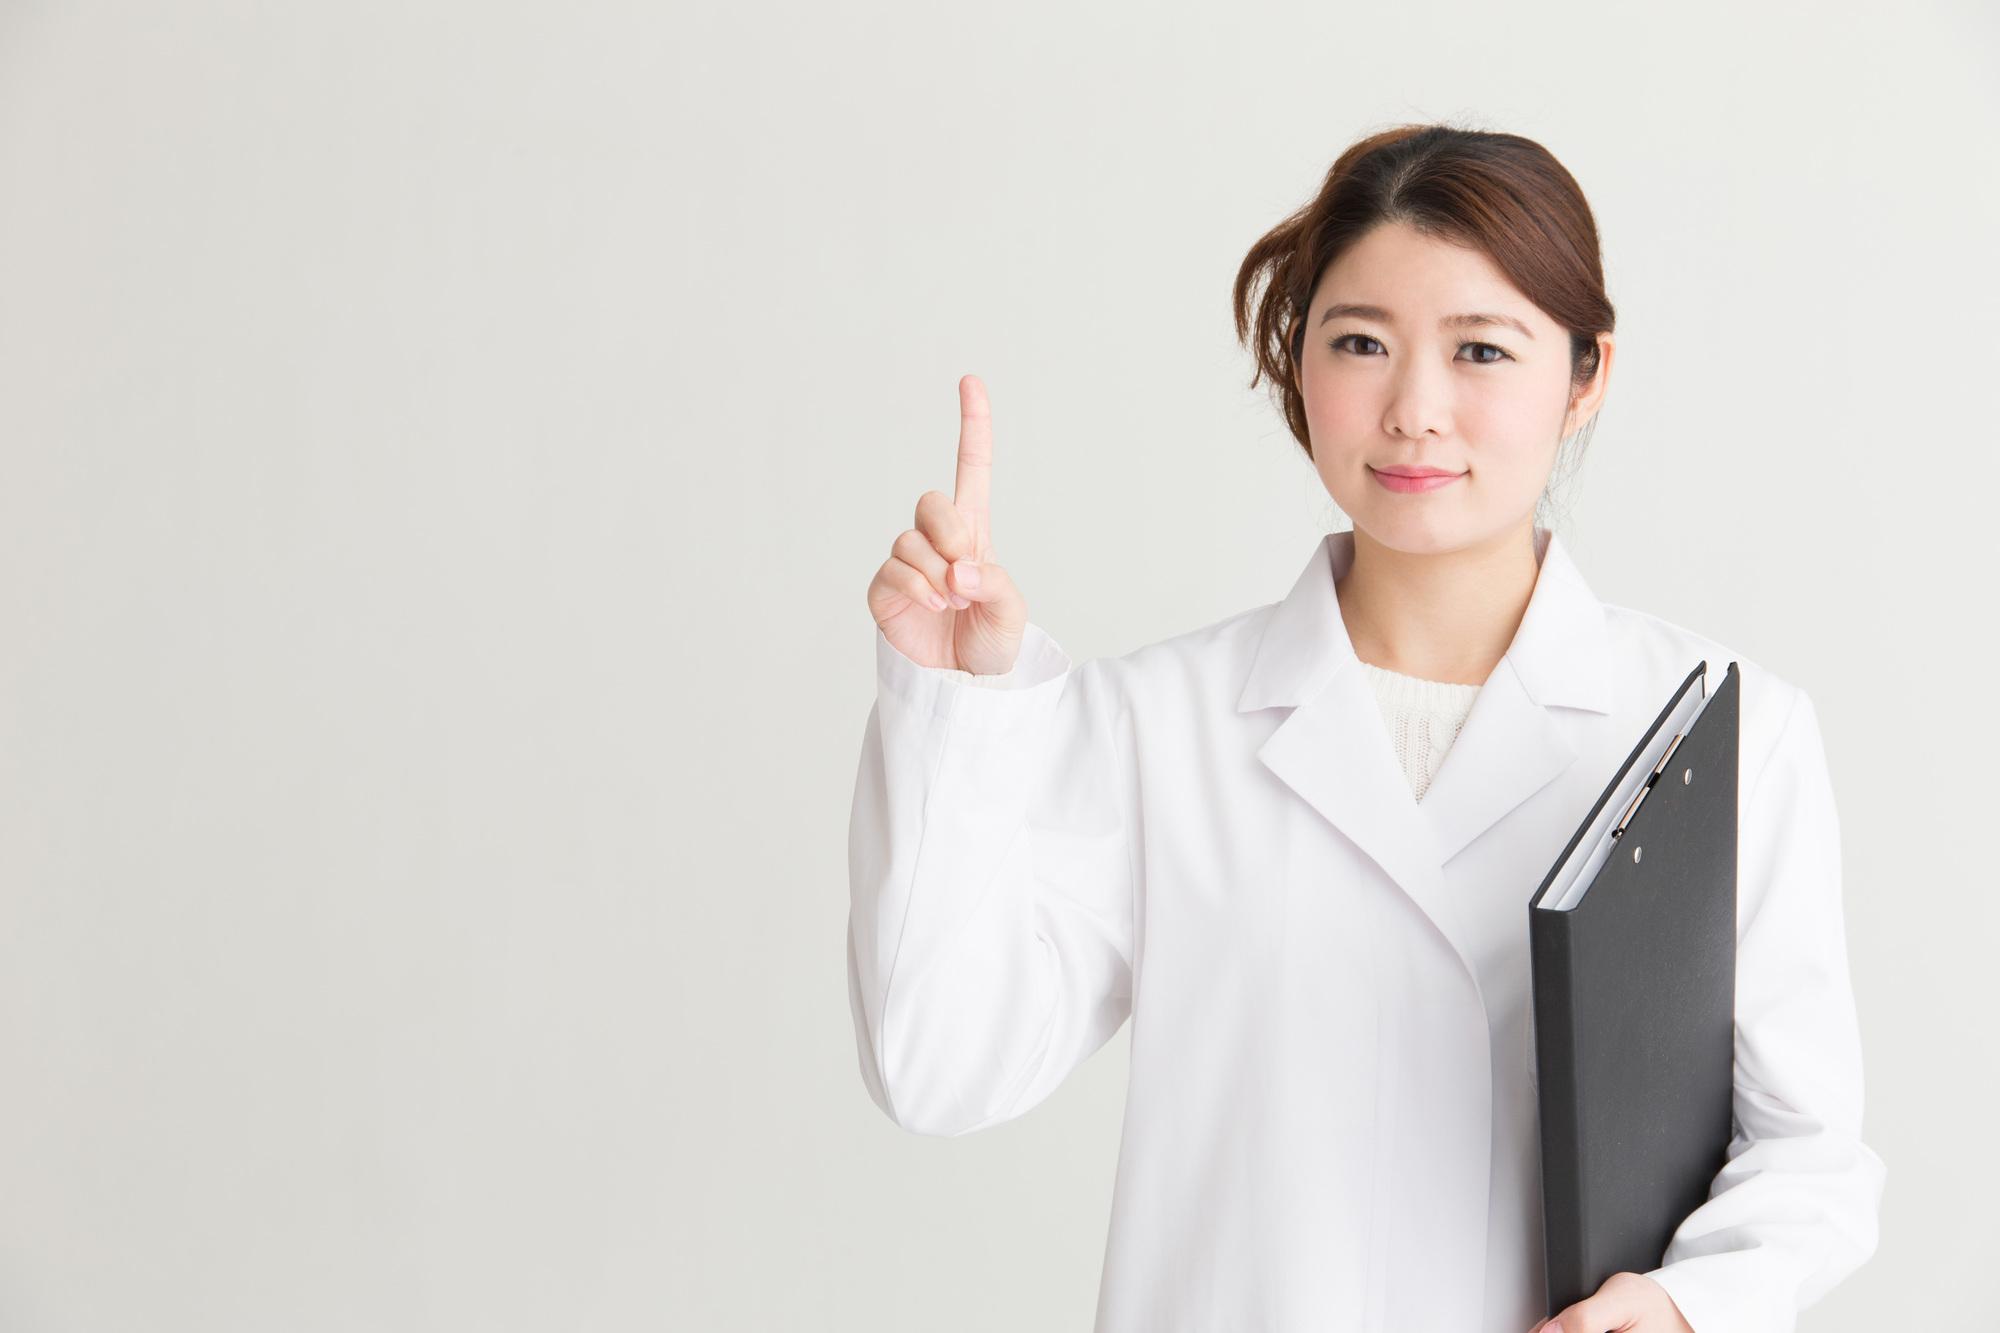 SFTS(重症熱性血小板減少症候群)とは ~ 症状や治療法を解説 ~